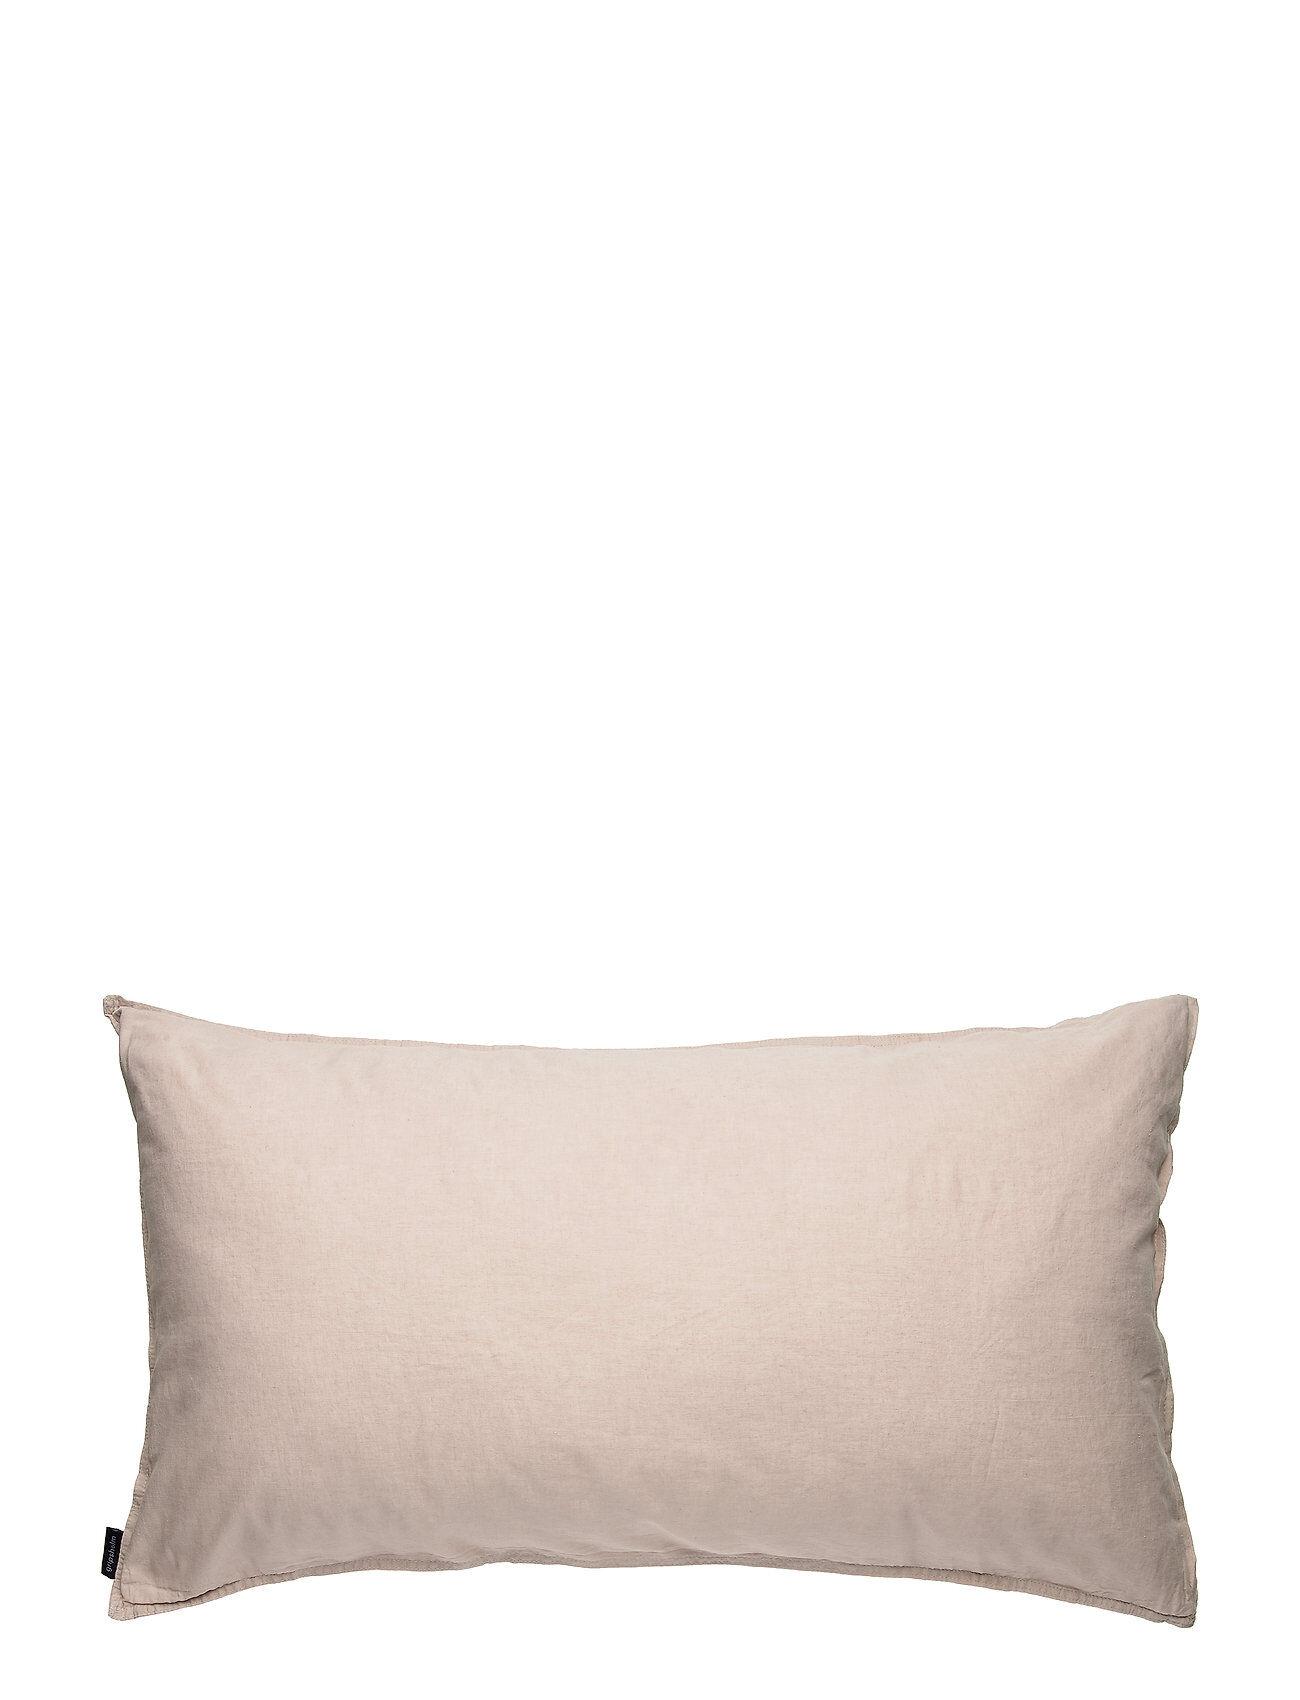 Gripsholm Pillowcase Linen Blend Home Bedroom Bedding Pillowcases Vaaleanpunainen Gripsholm